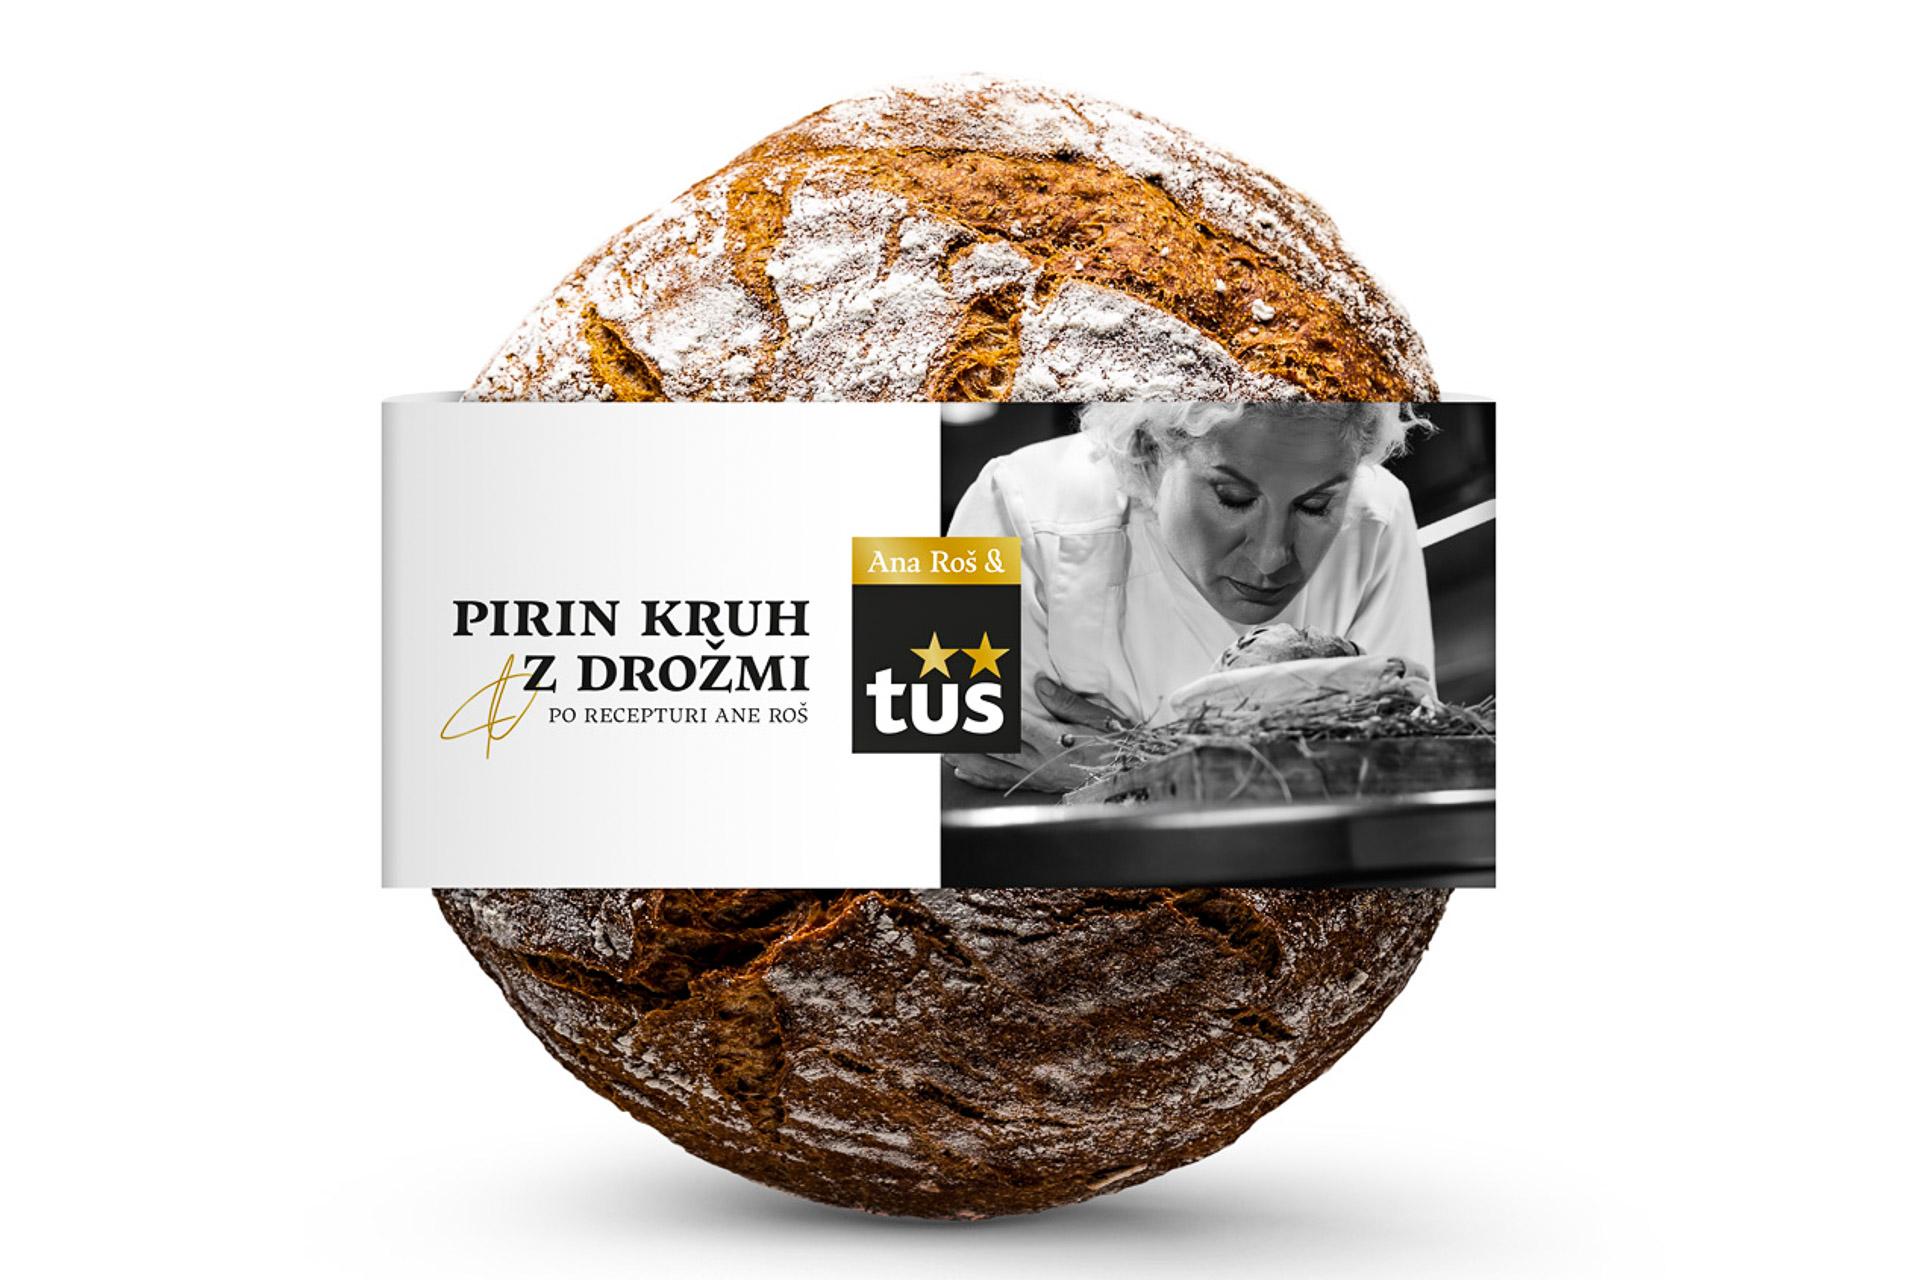 pirin kruh tuš001